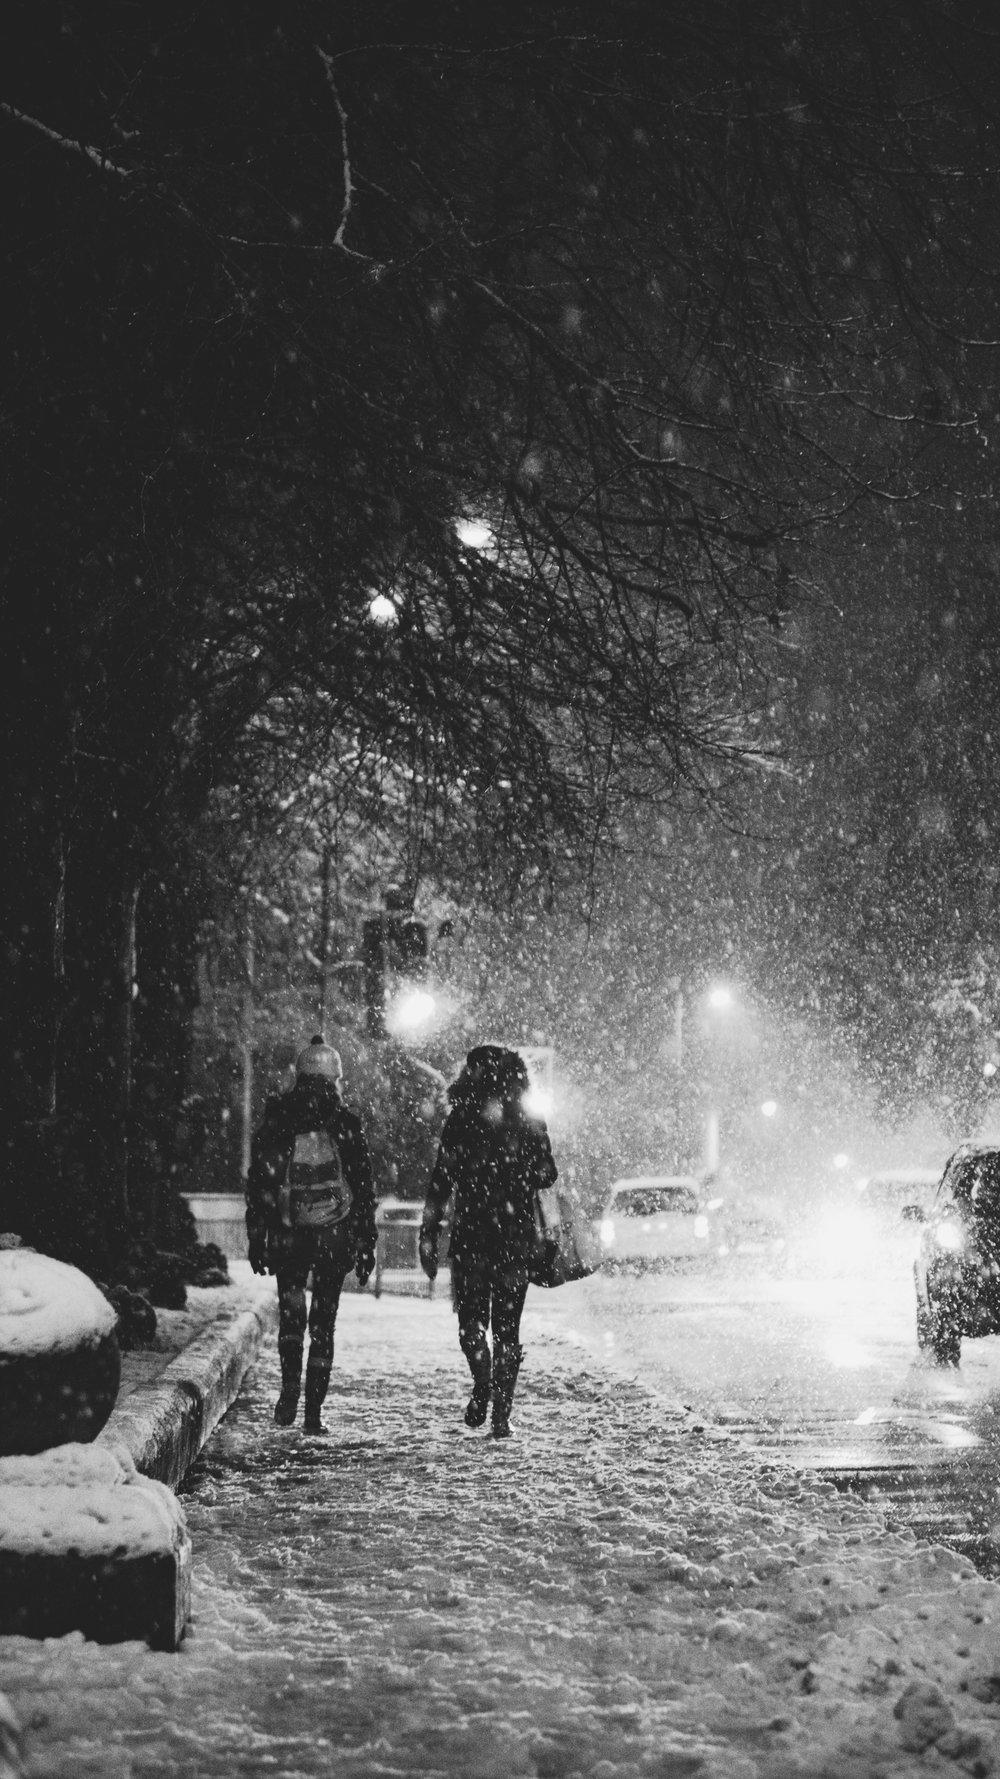 Cheltenham Snow Dec 17 pics-16.jpg